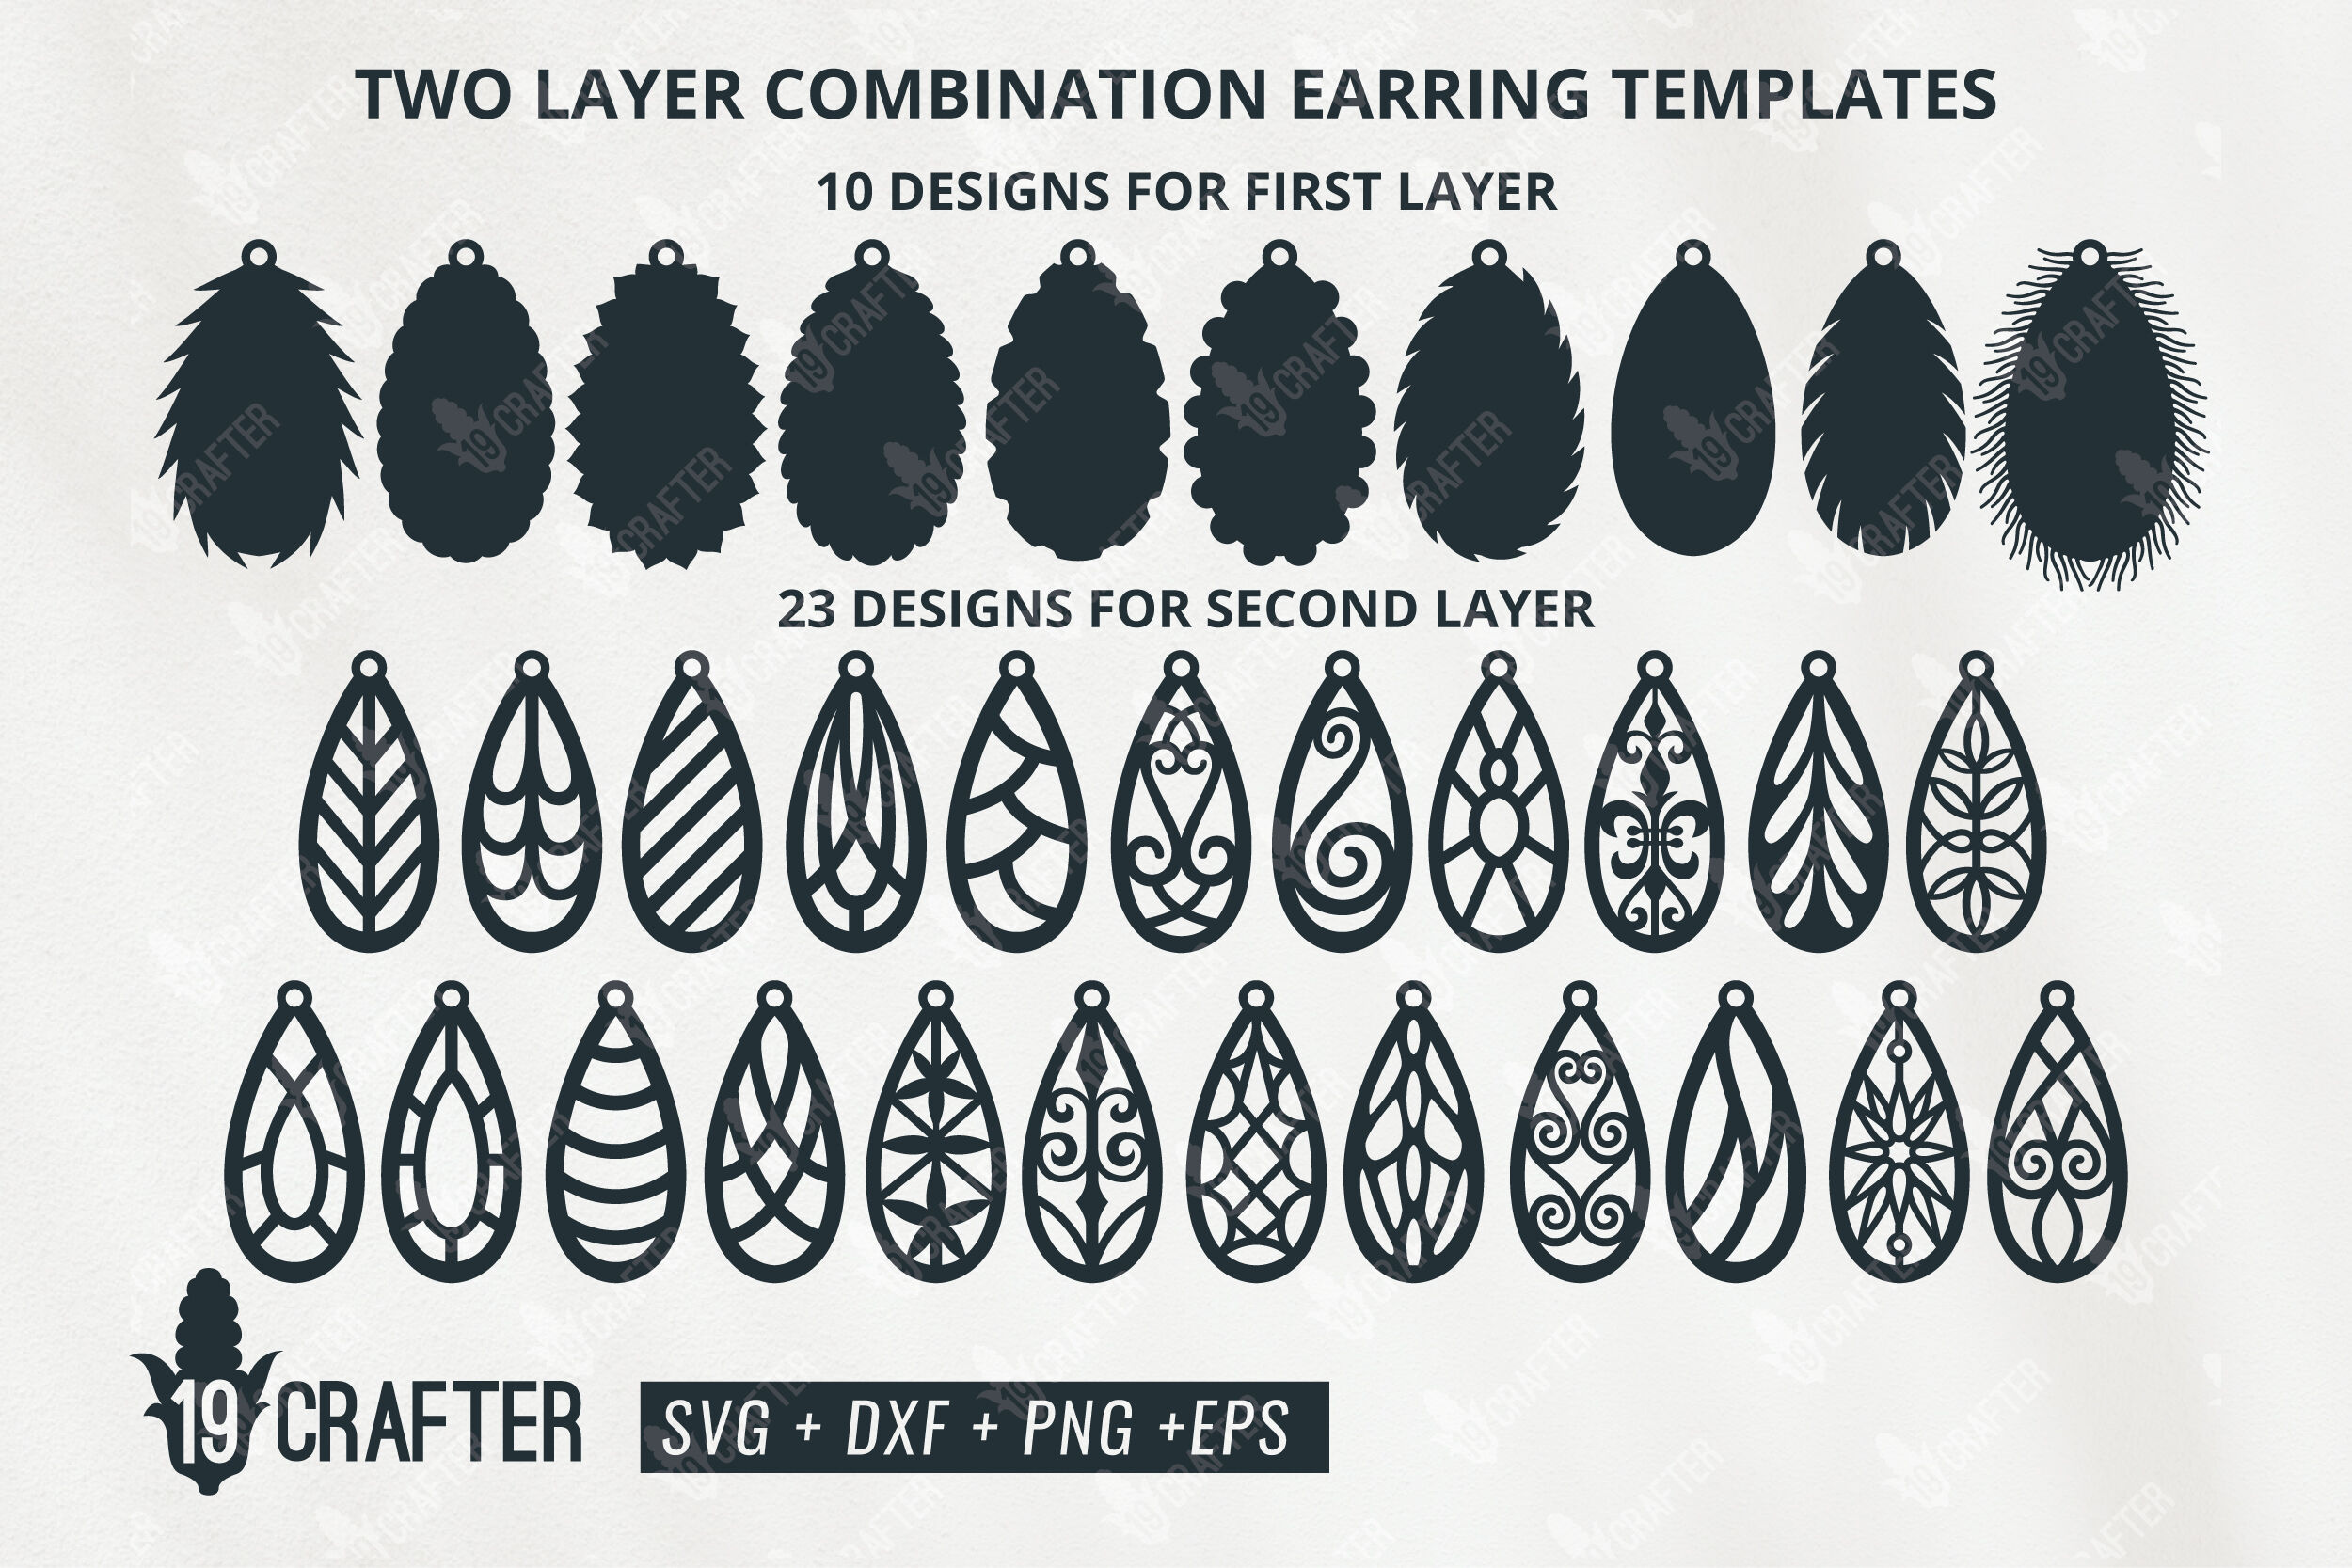 Two Layer Tear Drop Shape Earring Templates Svg Bundle By